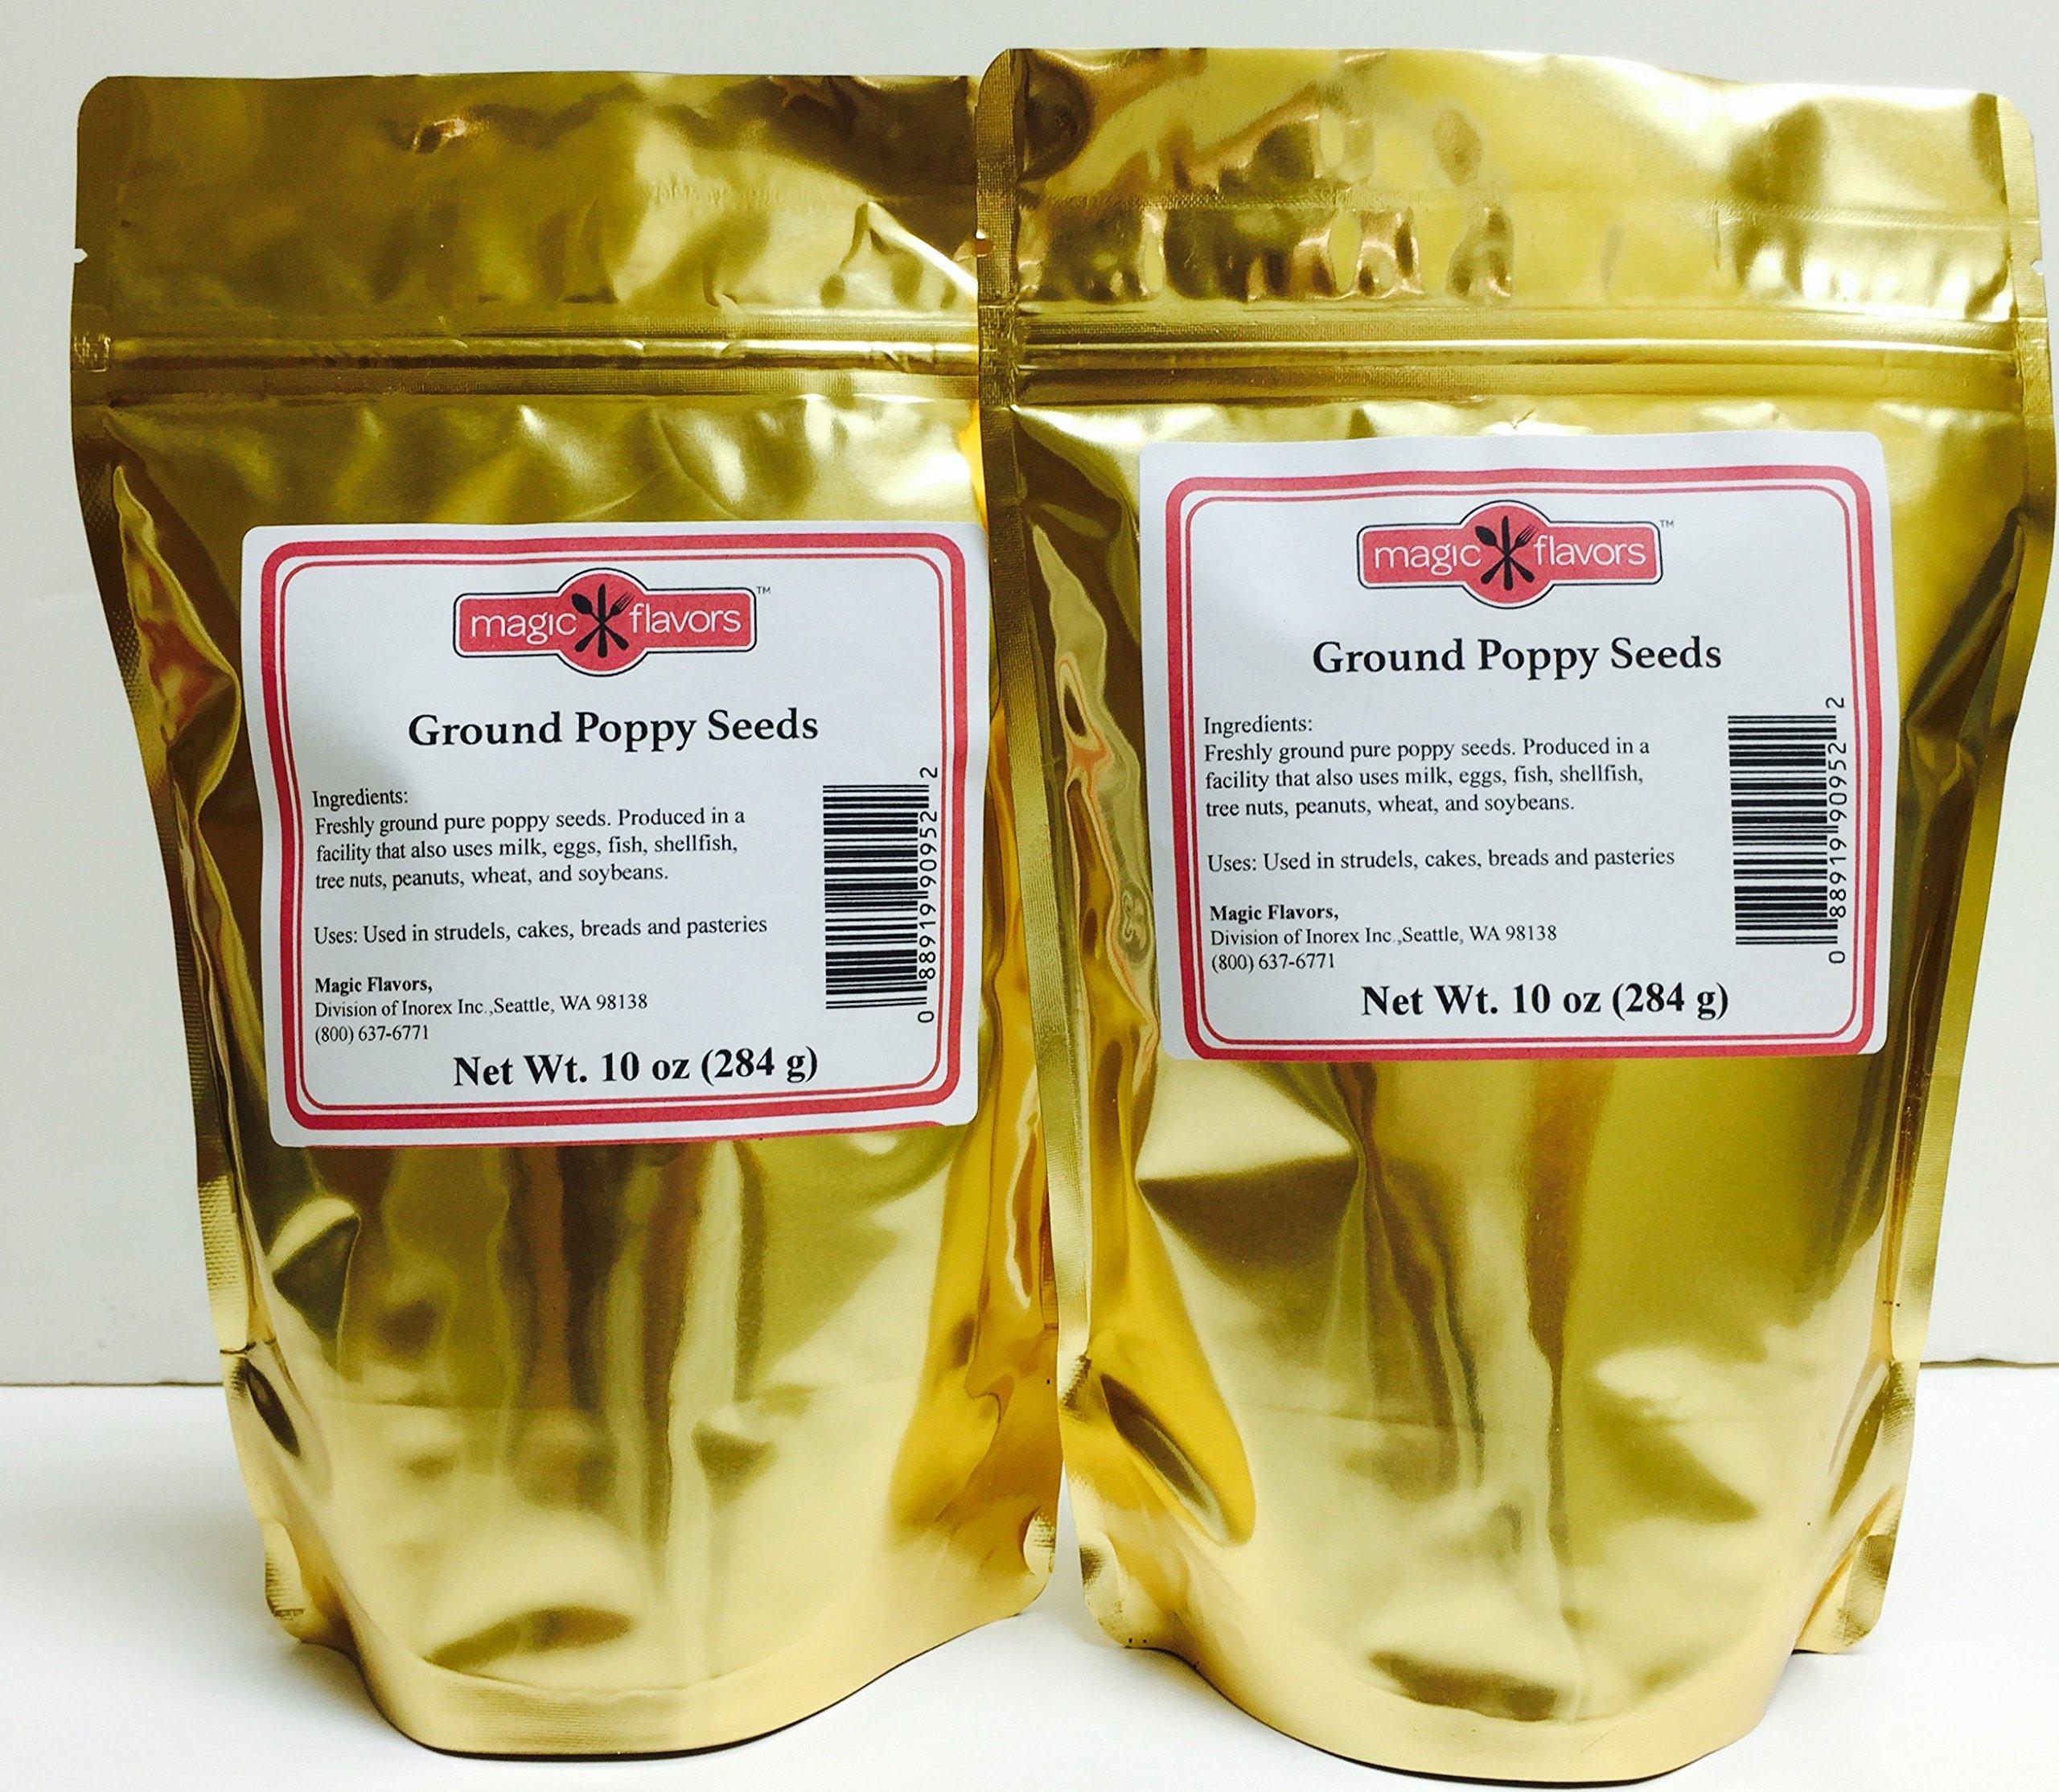 Magic Flavors Ground Poppy Seeds 20 oz (10 oz per pouch)